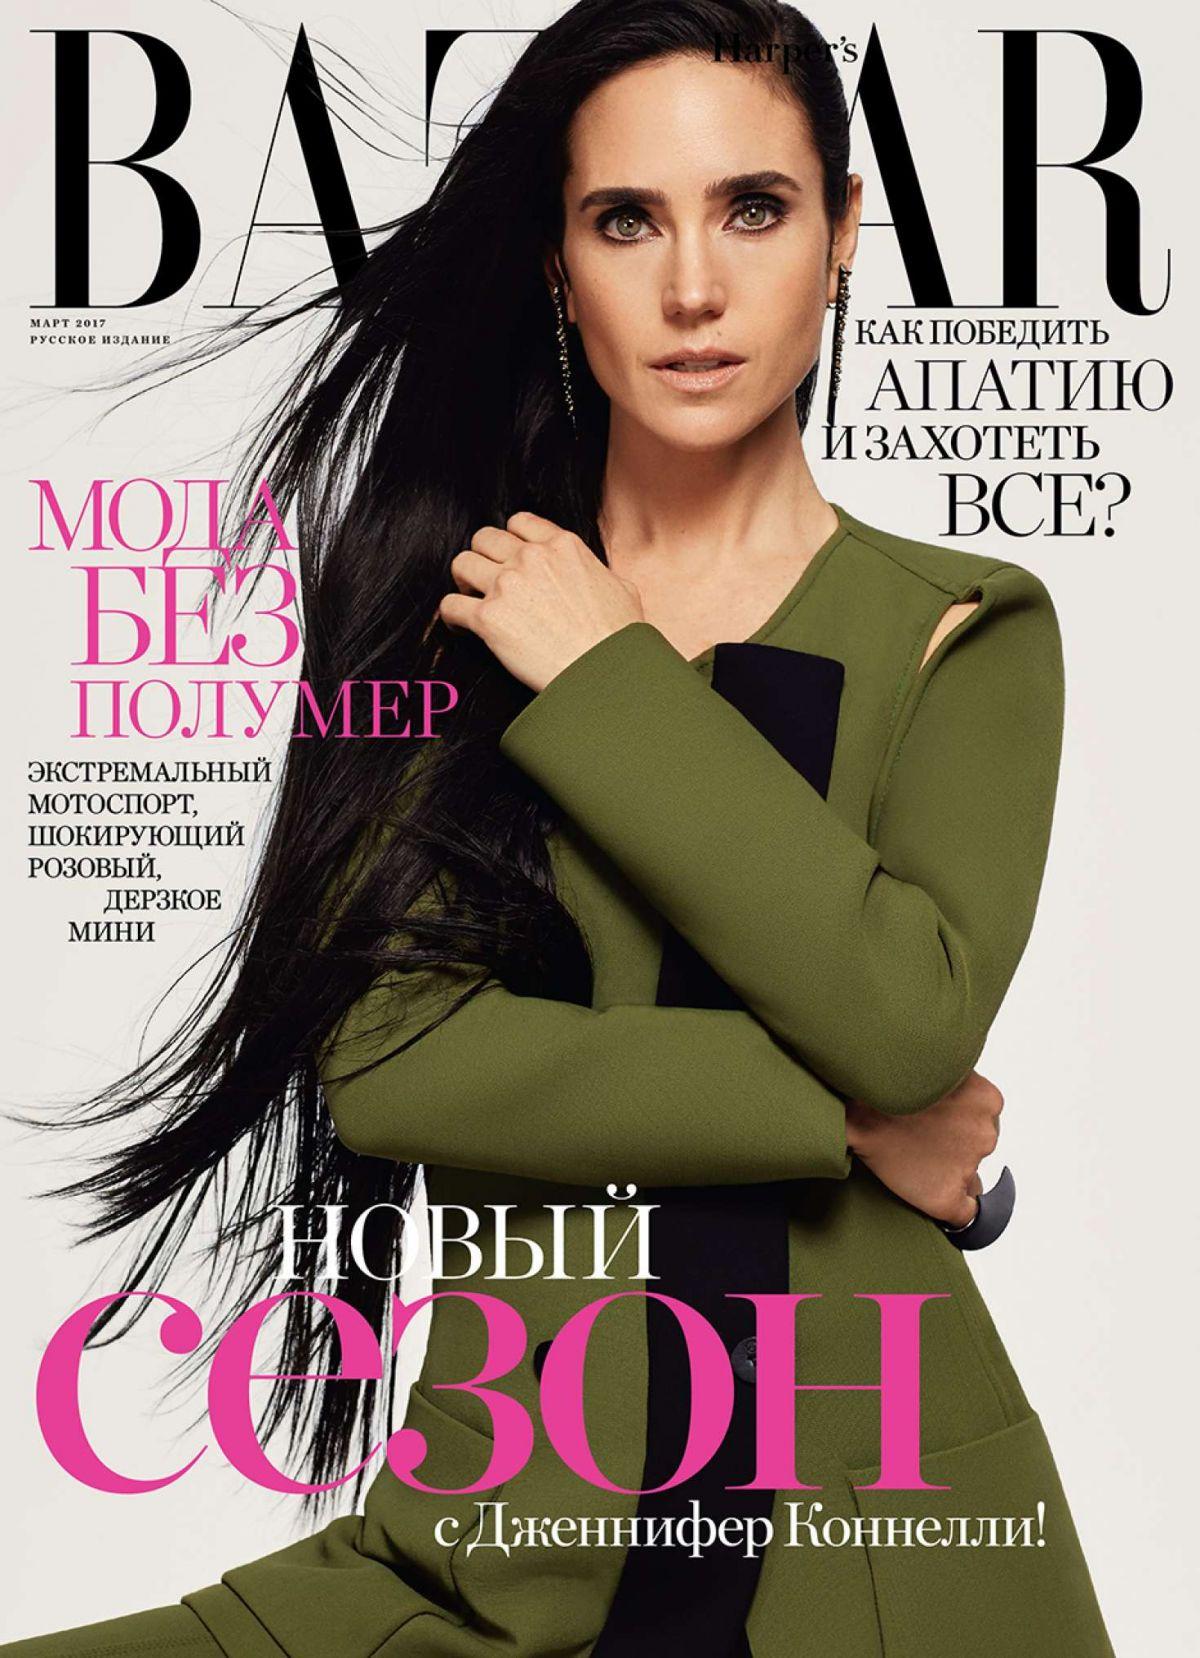 March 2017 Popsugar Must Have Box Review: JENNIFER CONNELLY In Harper's Bazaar Magazine, Russia